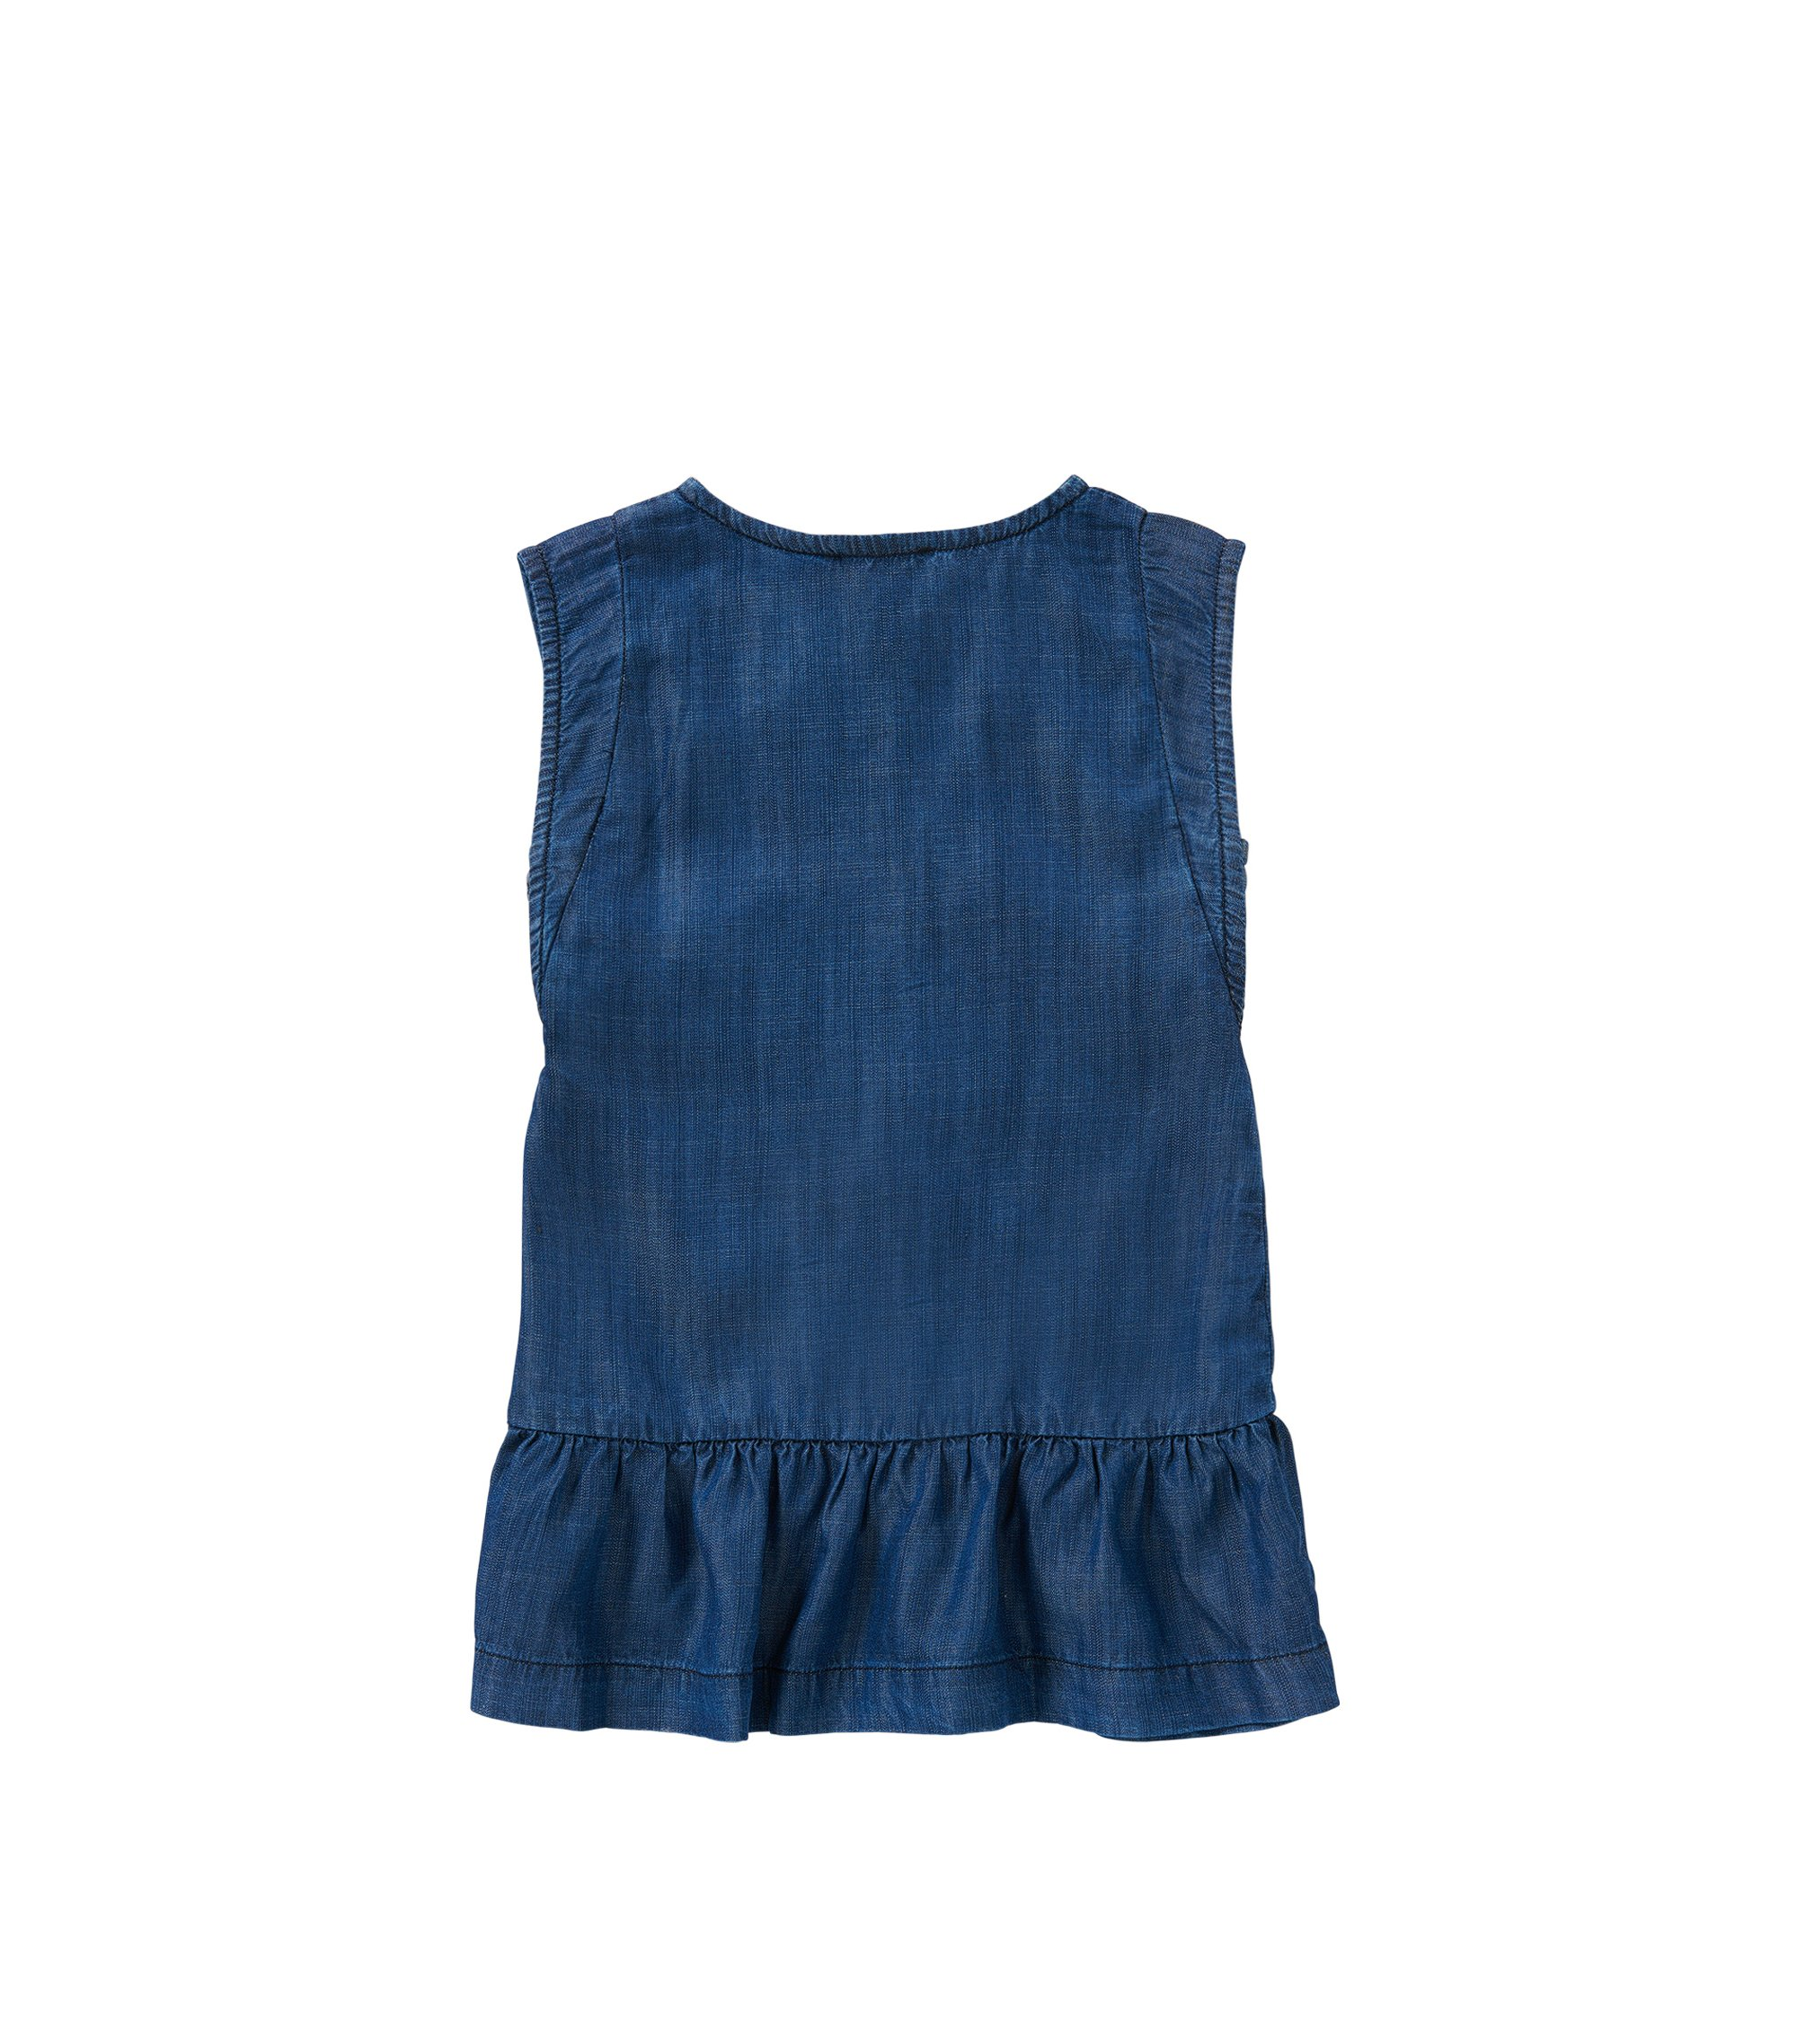 'J12149'   Girls Tencel Denim Buttoned Dress , Patterned